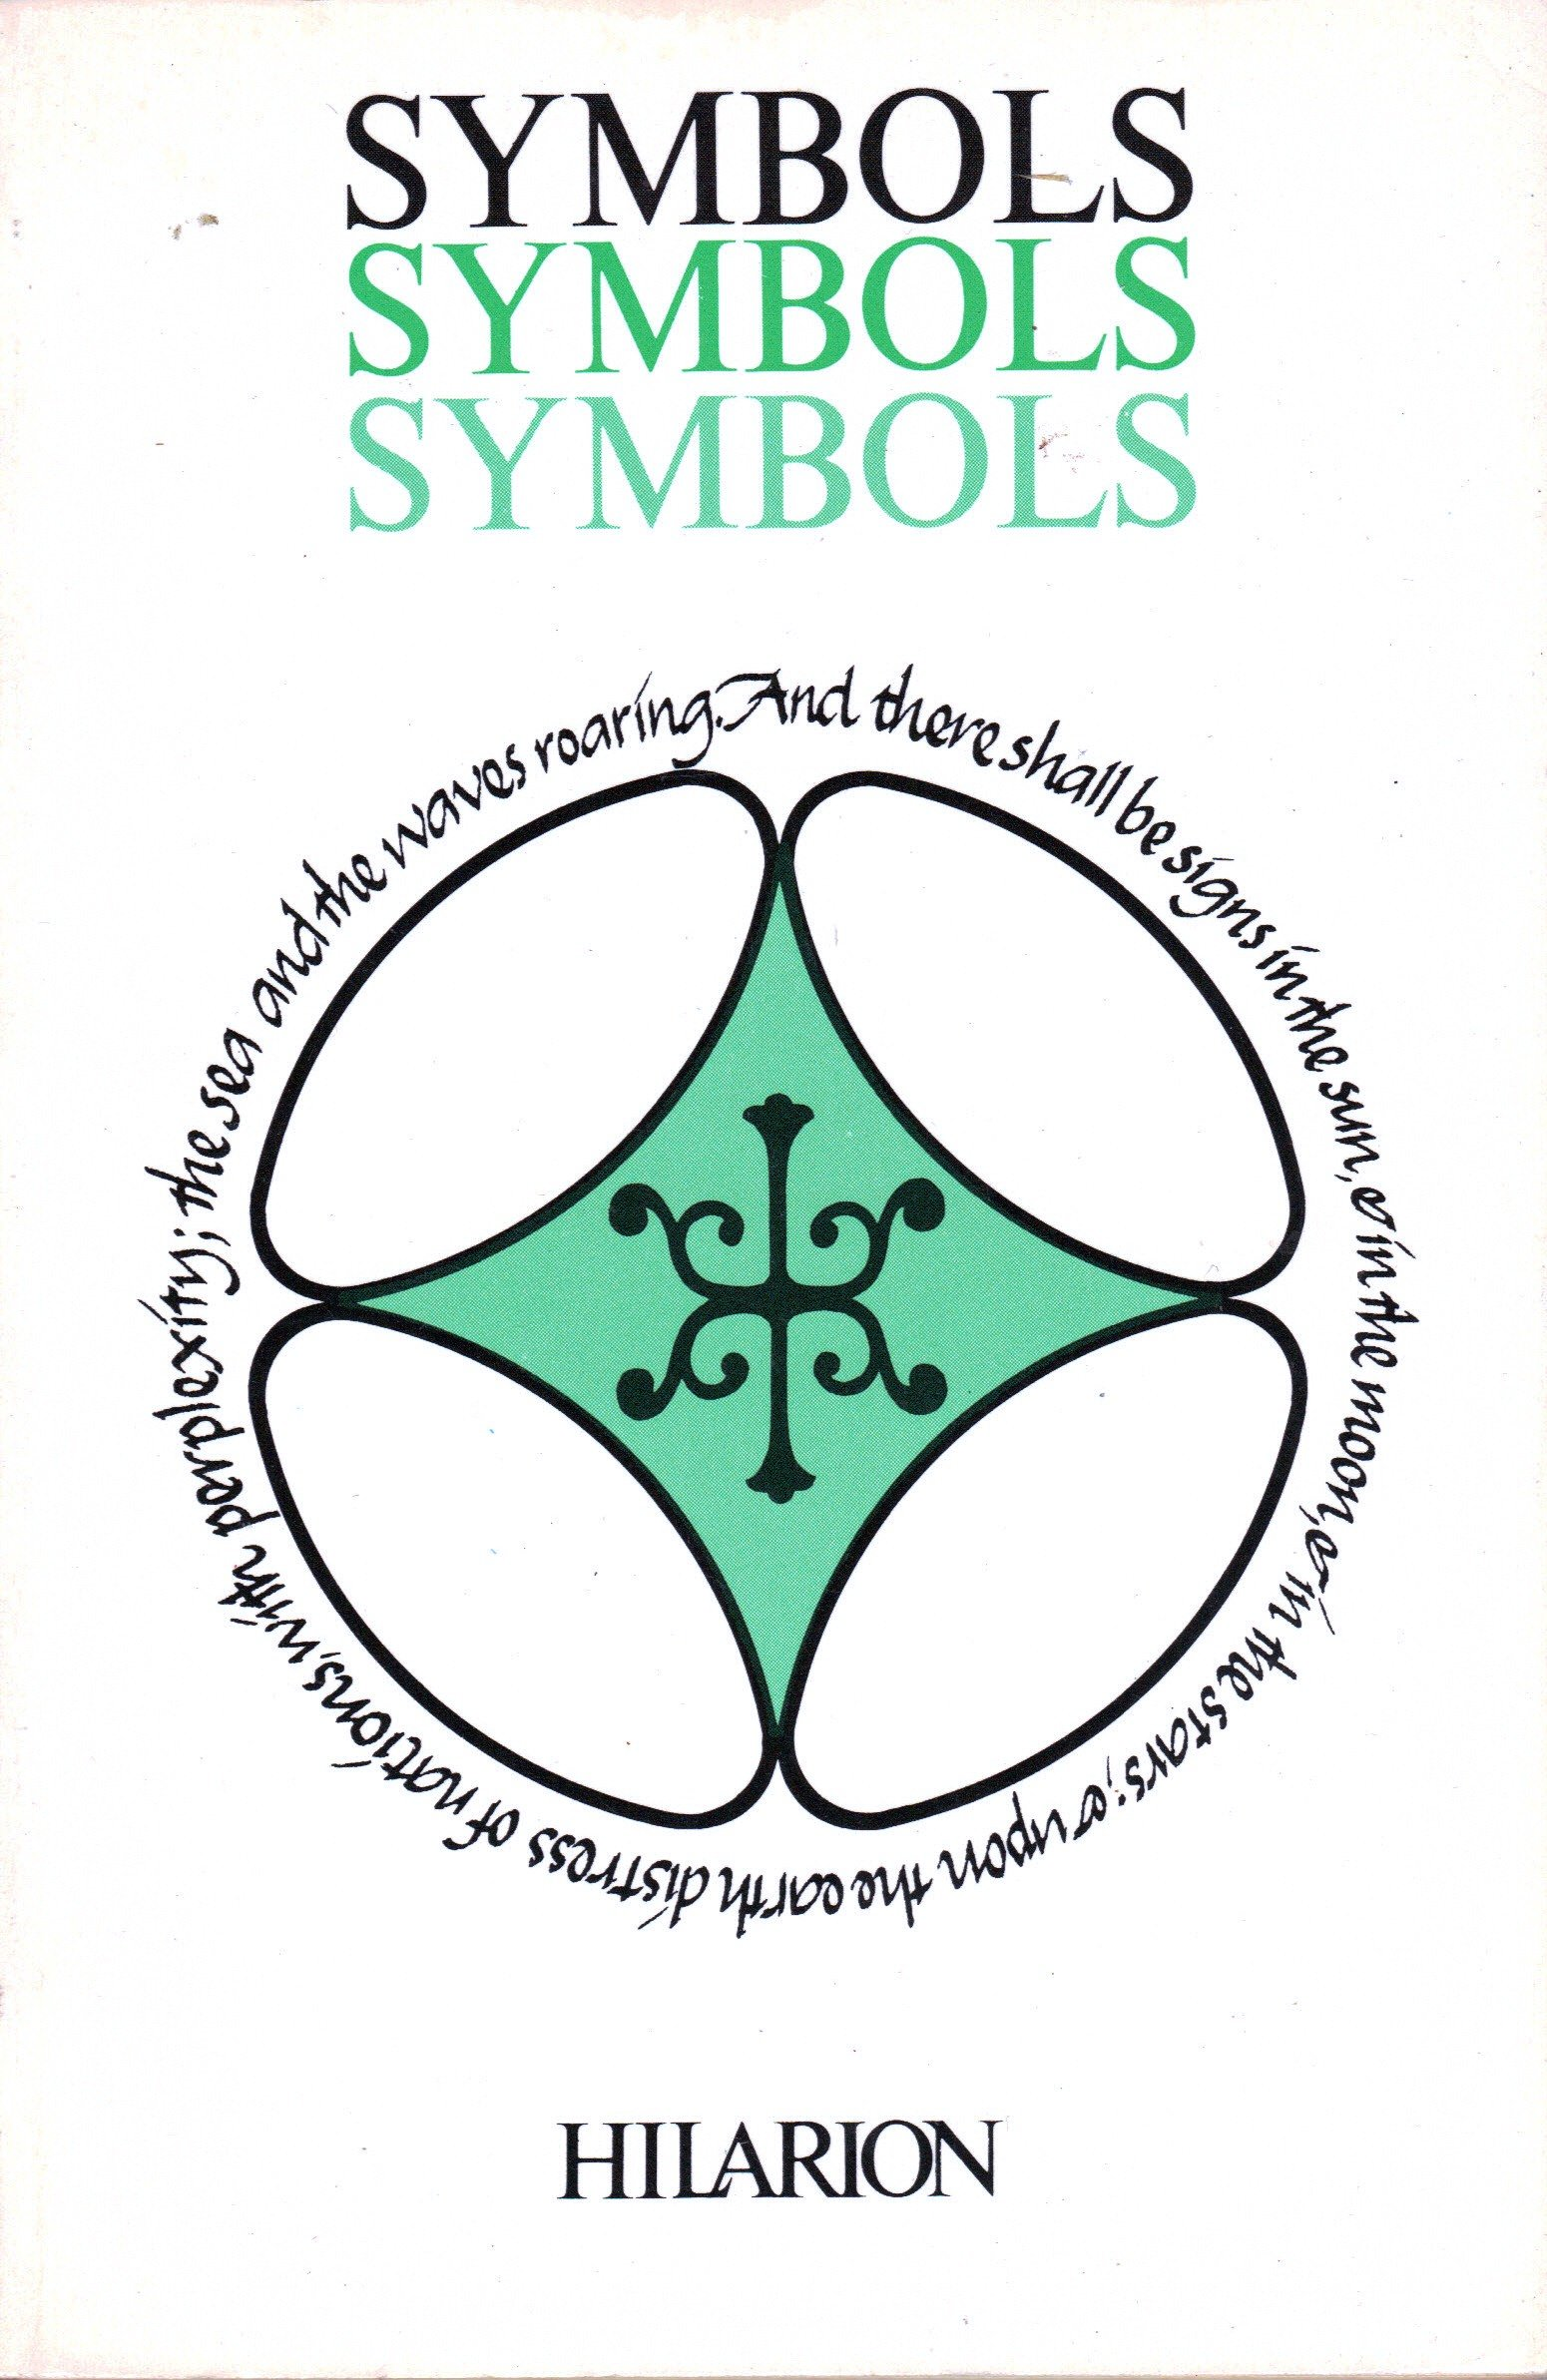 Symbols, Hilarion